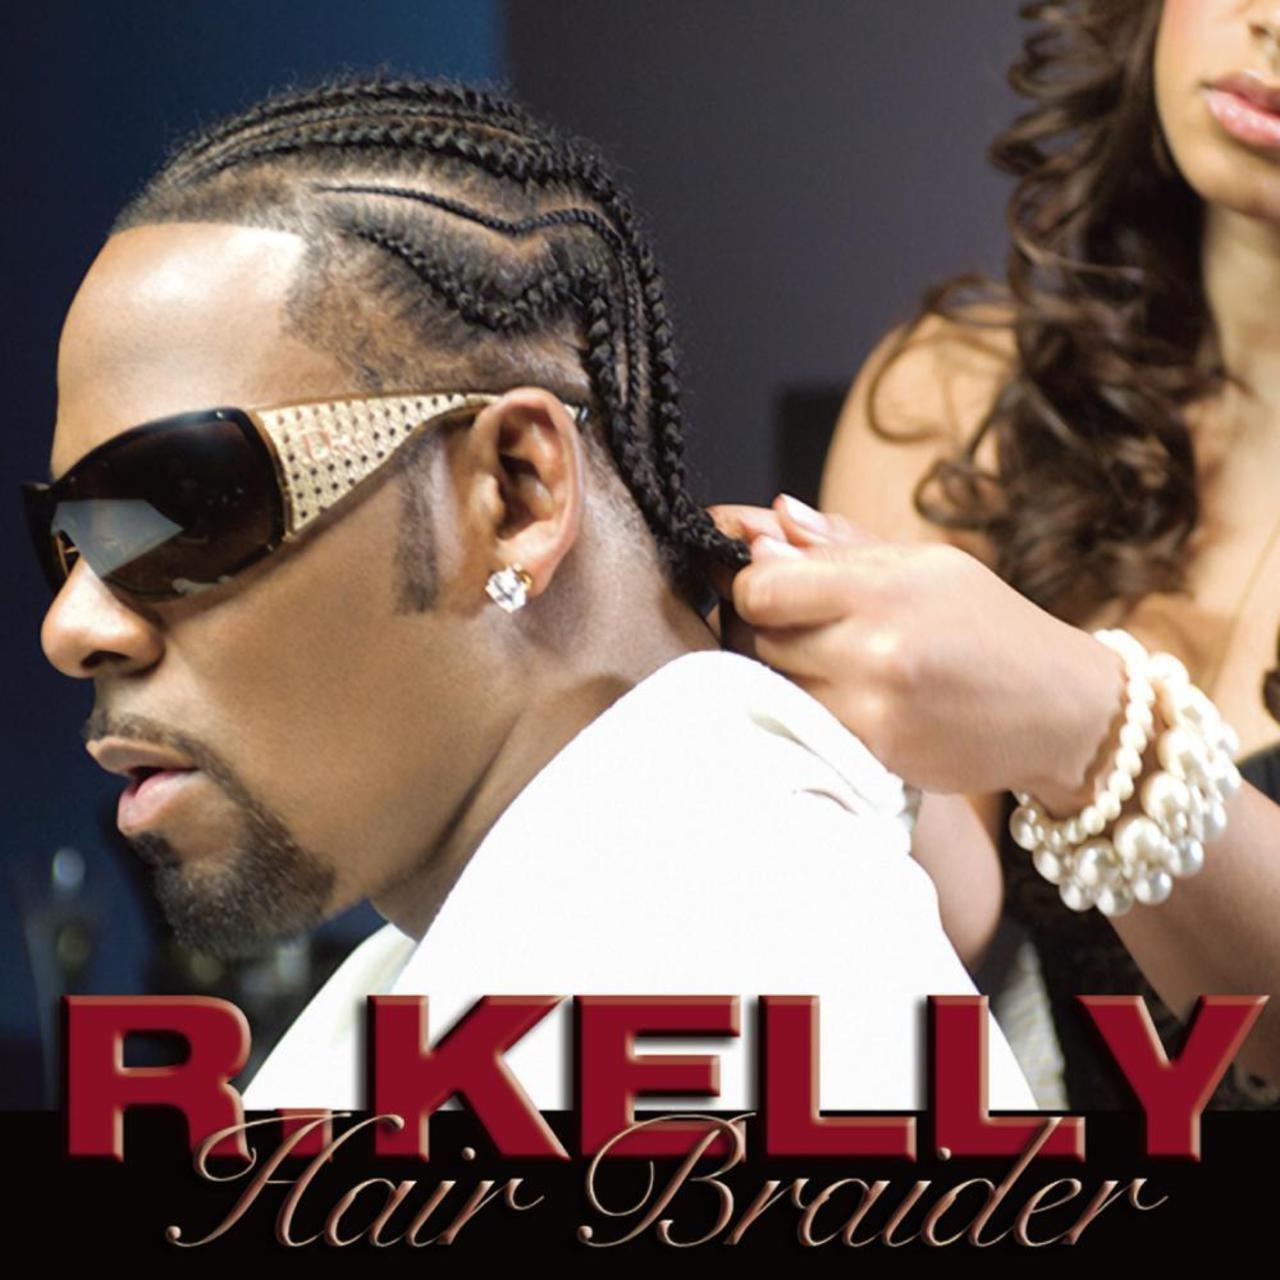 R. Kelly - Hair Braider